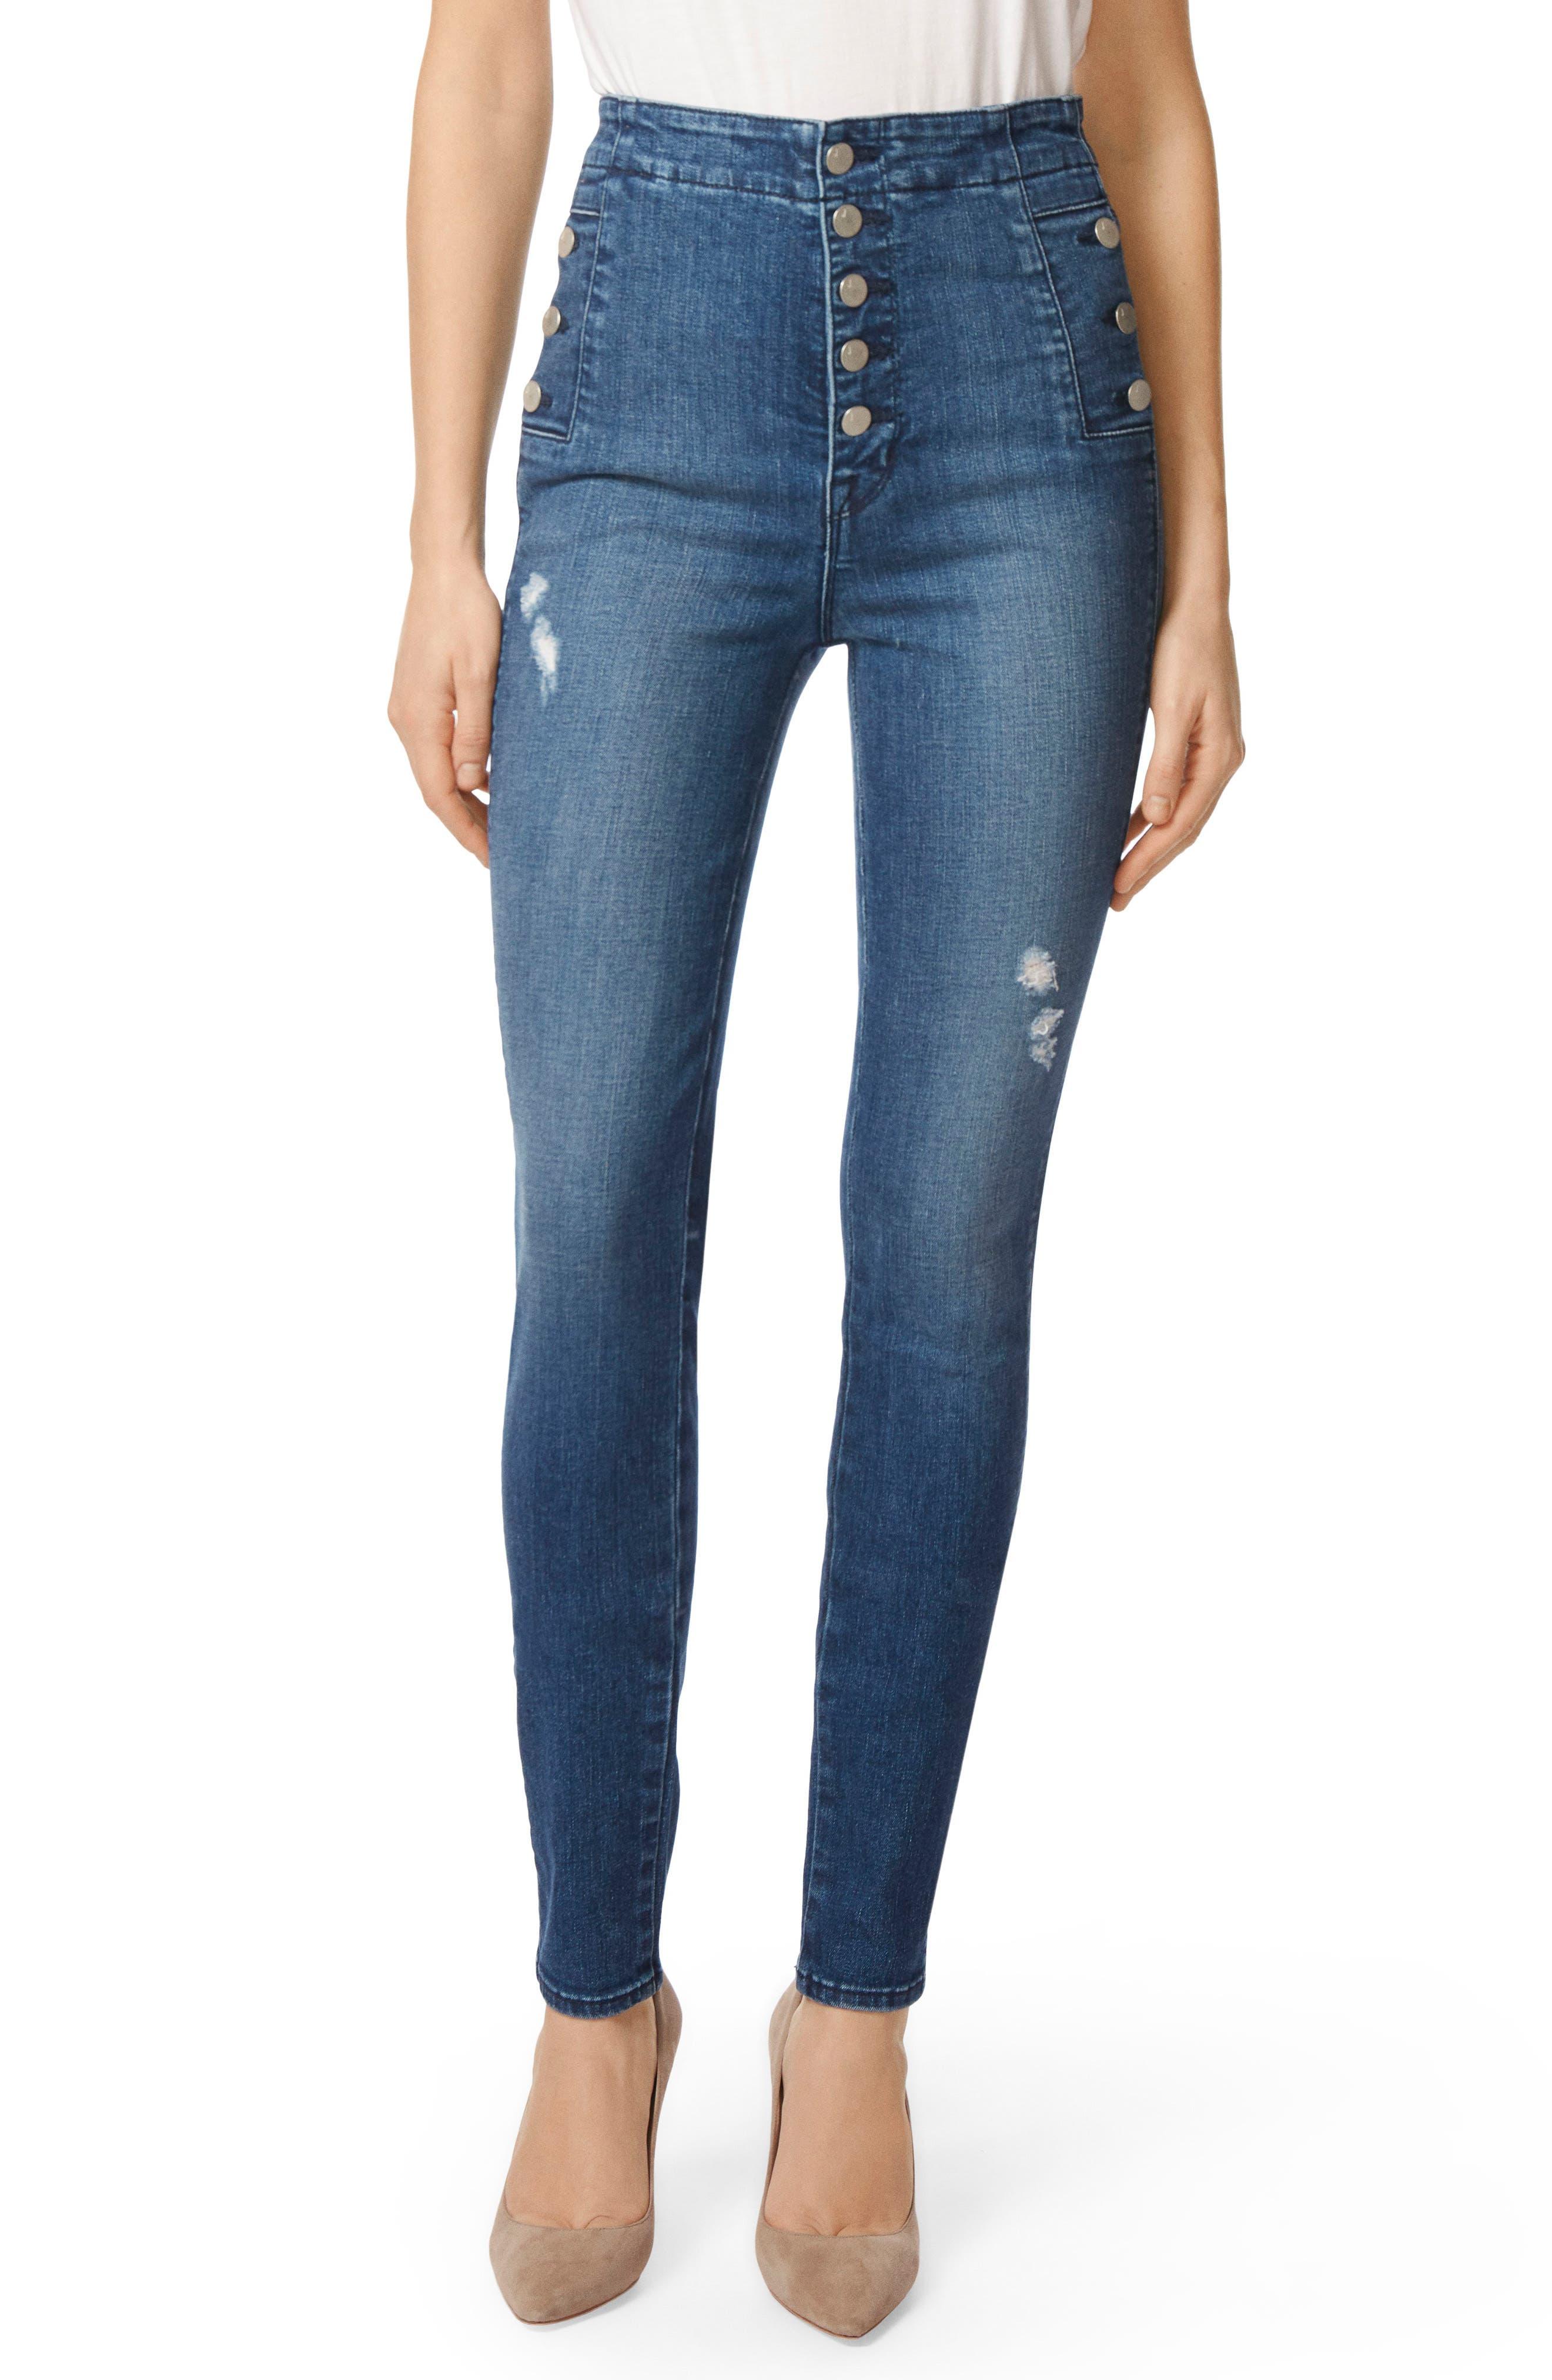 Natasha Sky High High Waist Skinny Jeans,                         Main,                         color, 234